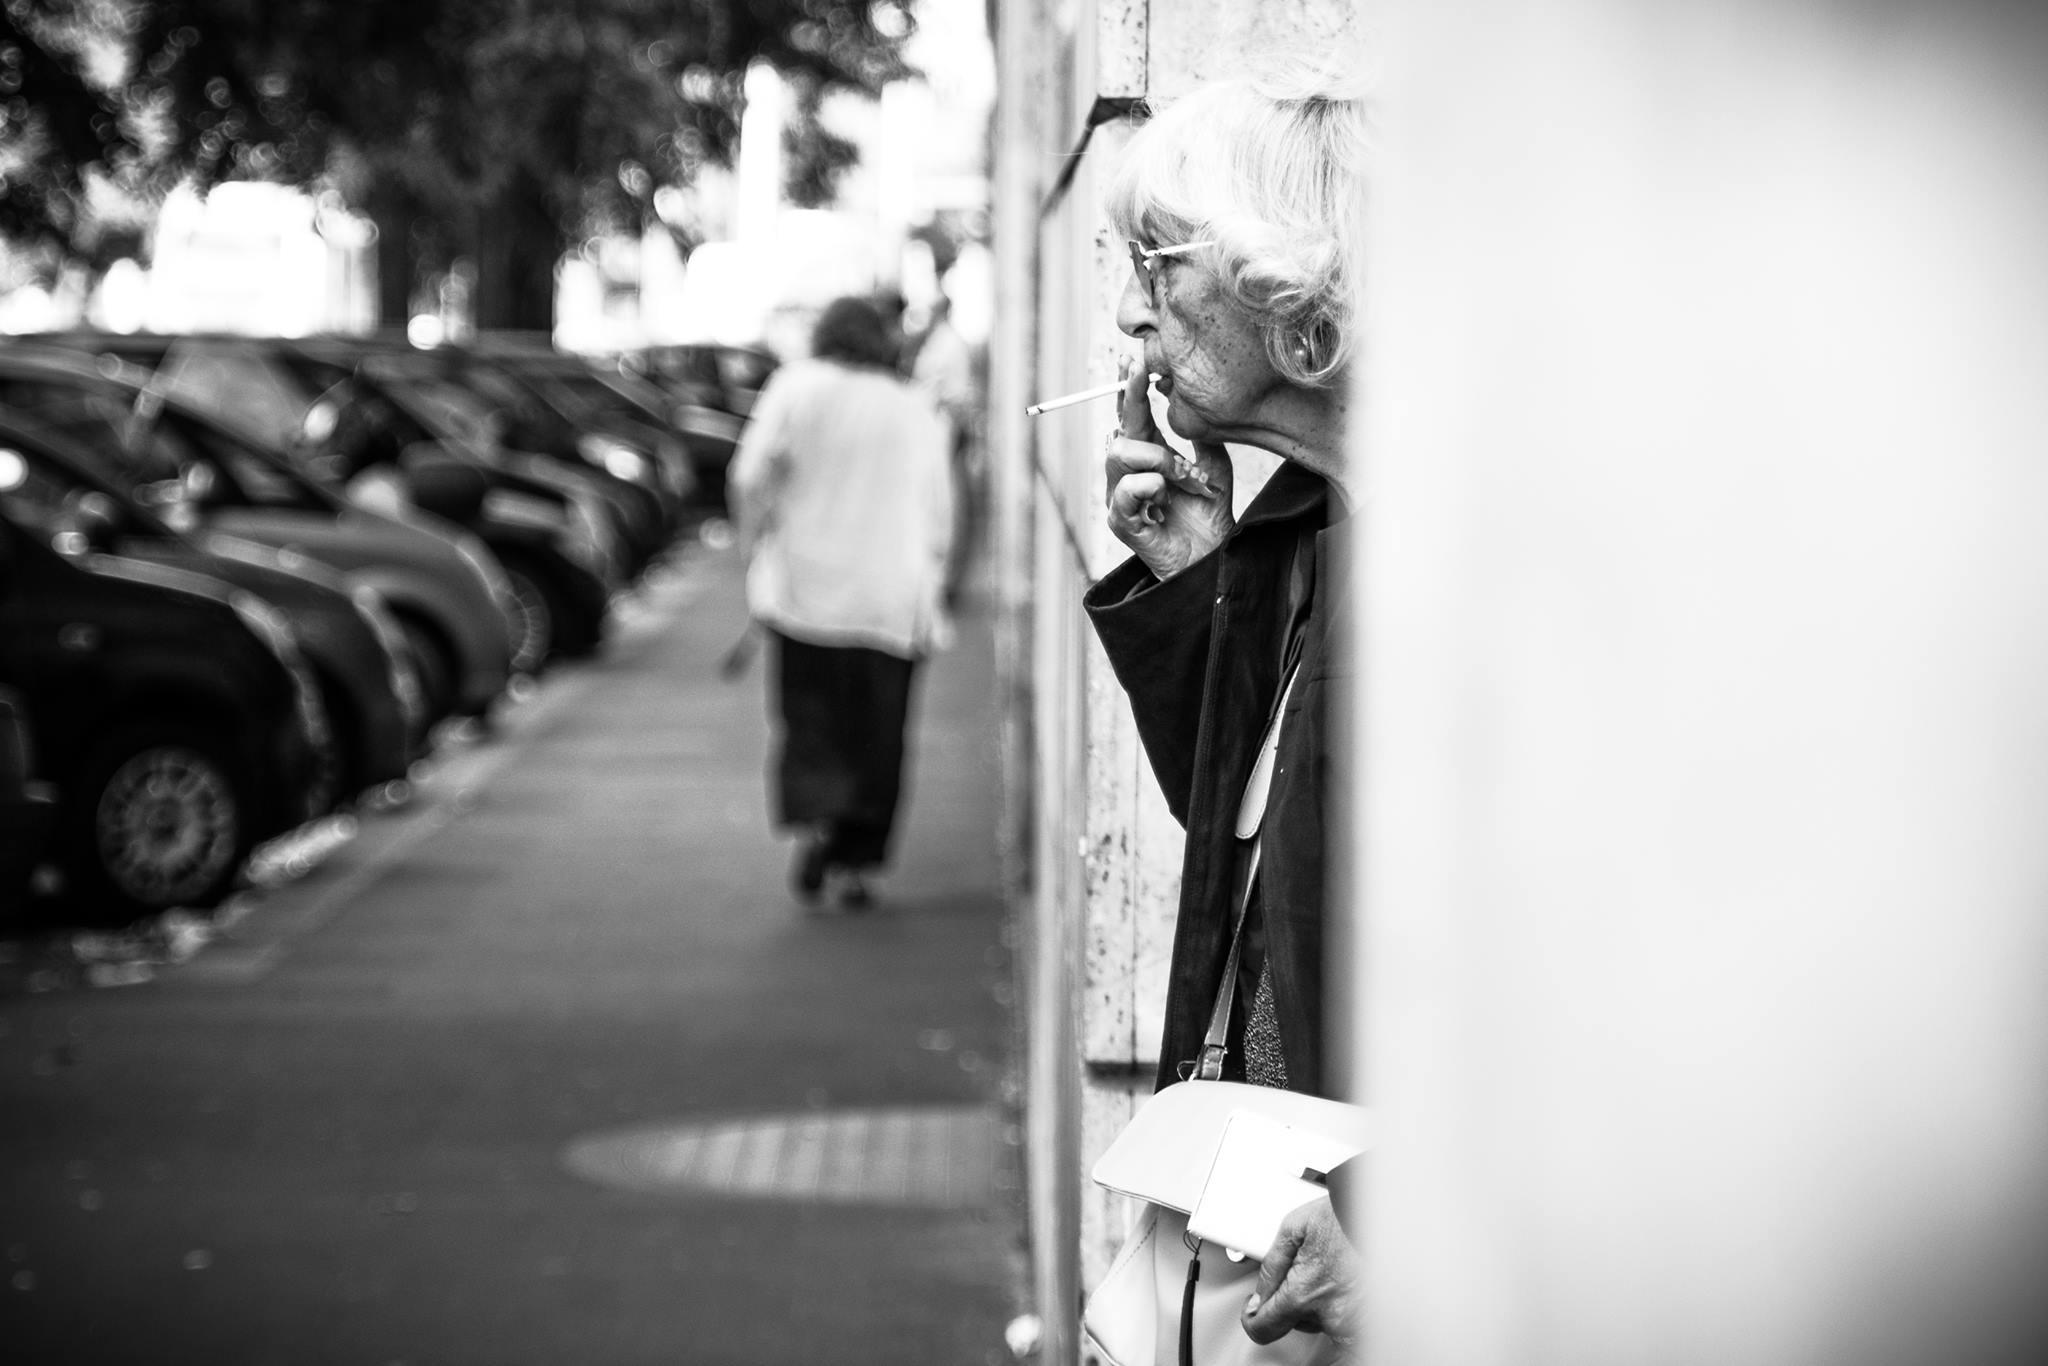 Roma Street Photography - Profili di strada - Pic by © Francesco Torrice